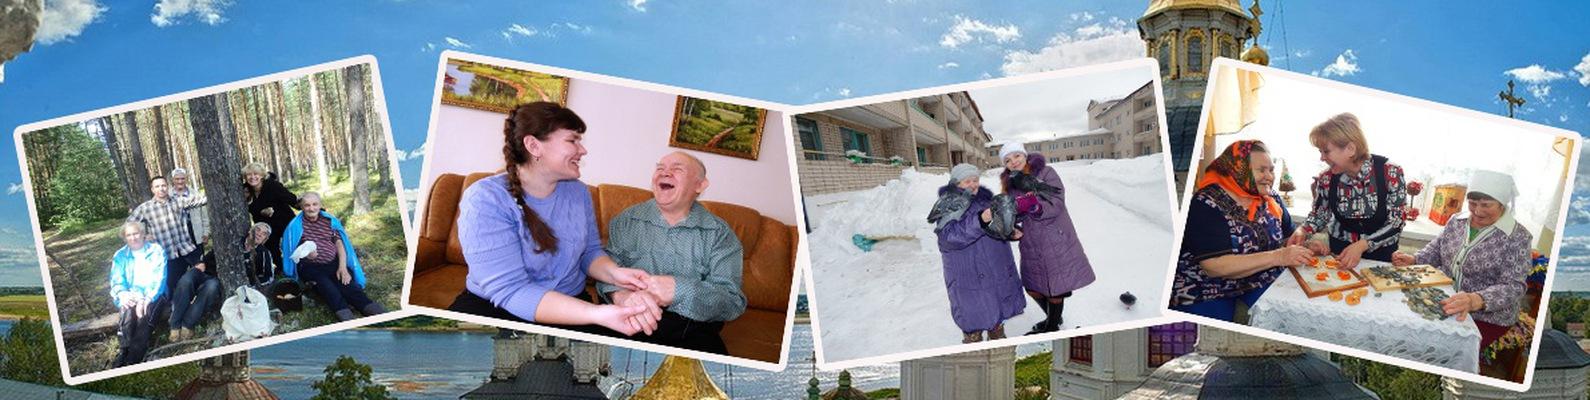 Дом престарелых красавино дом престарелых в ивайтенки